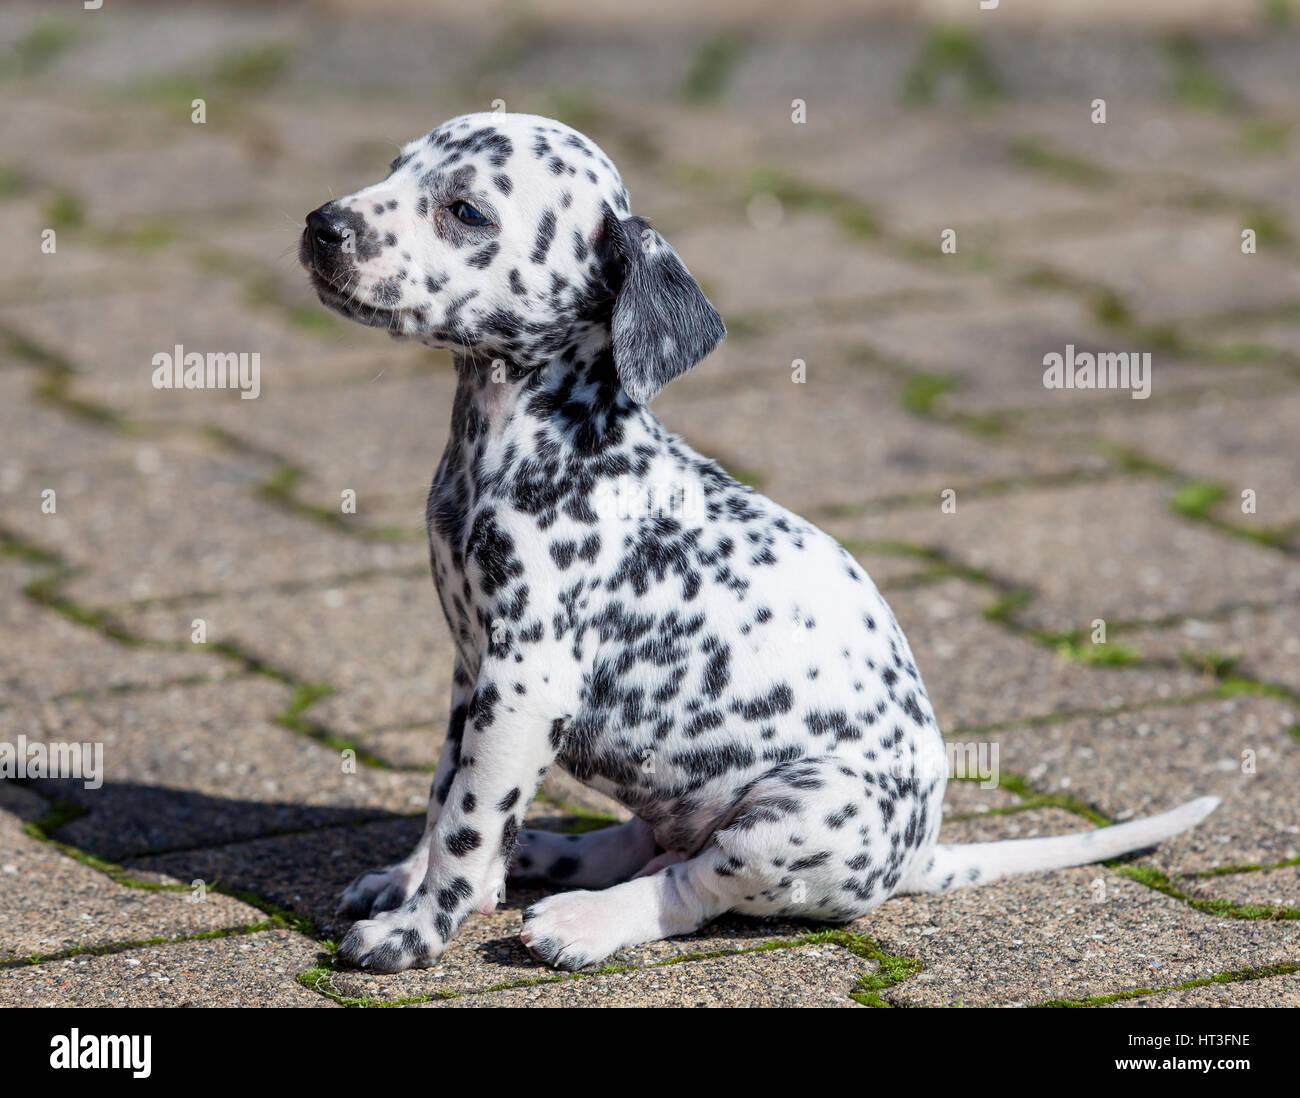 Dalmatian dog. Dalmatian puppy. - Stock Image